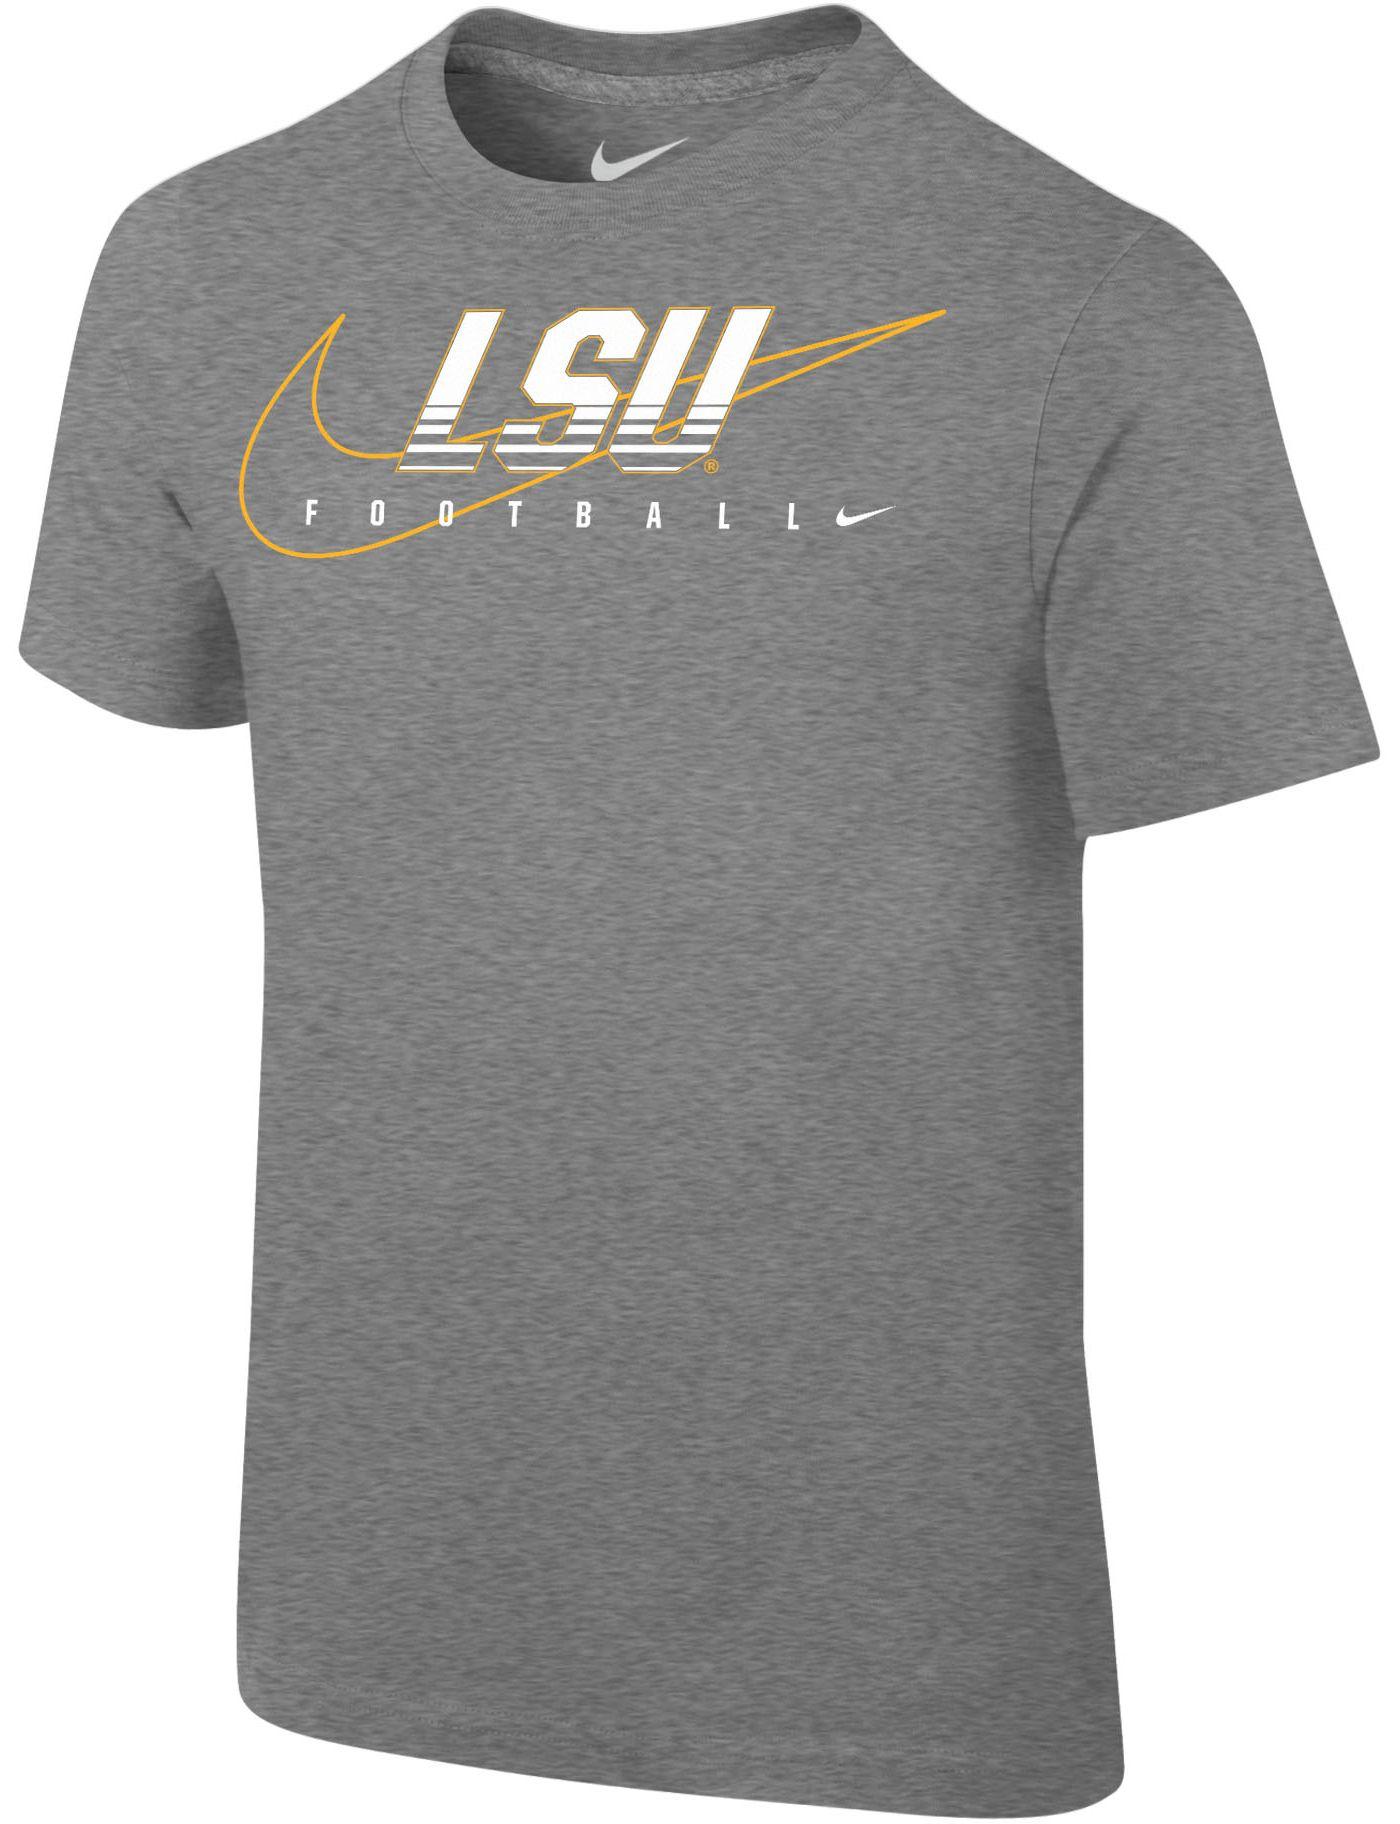 Nike Youth LSU Tigers Grey Football Dri-FIT Cotton Preschool Facility T-Shirt